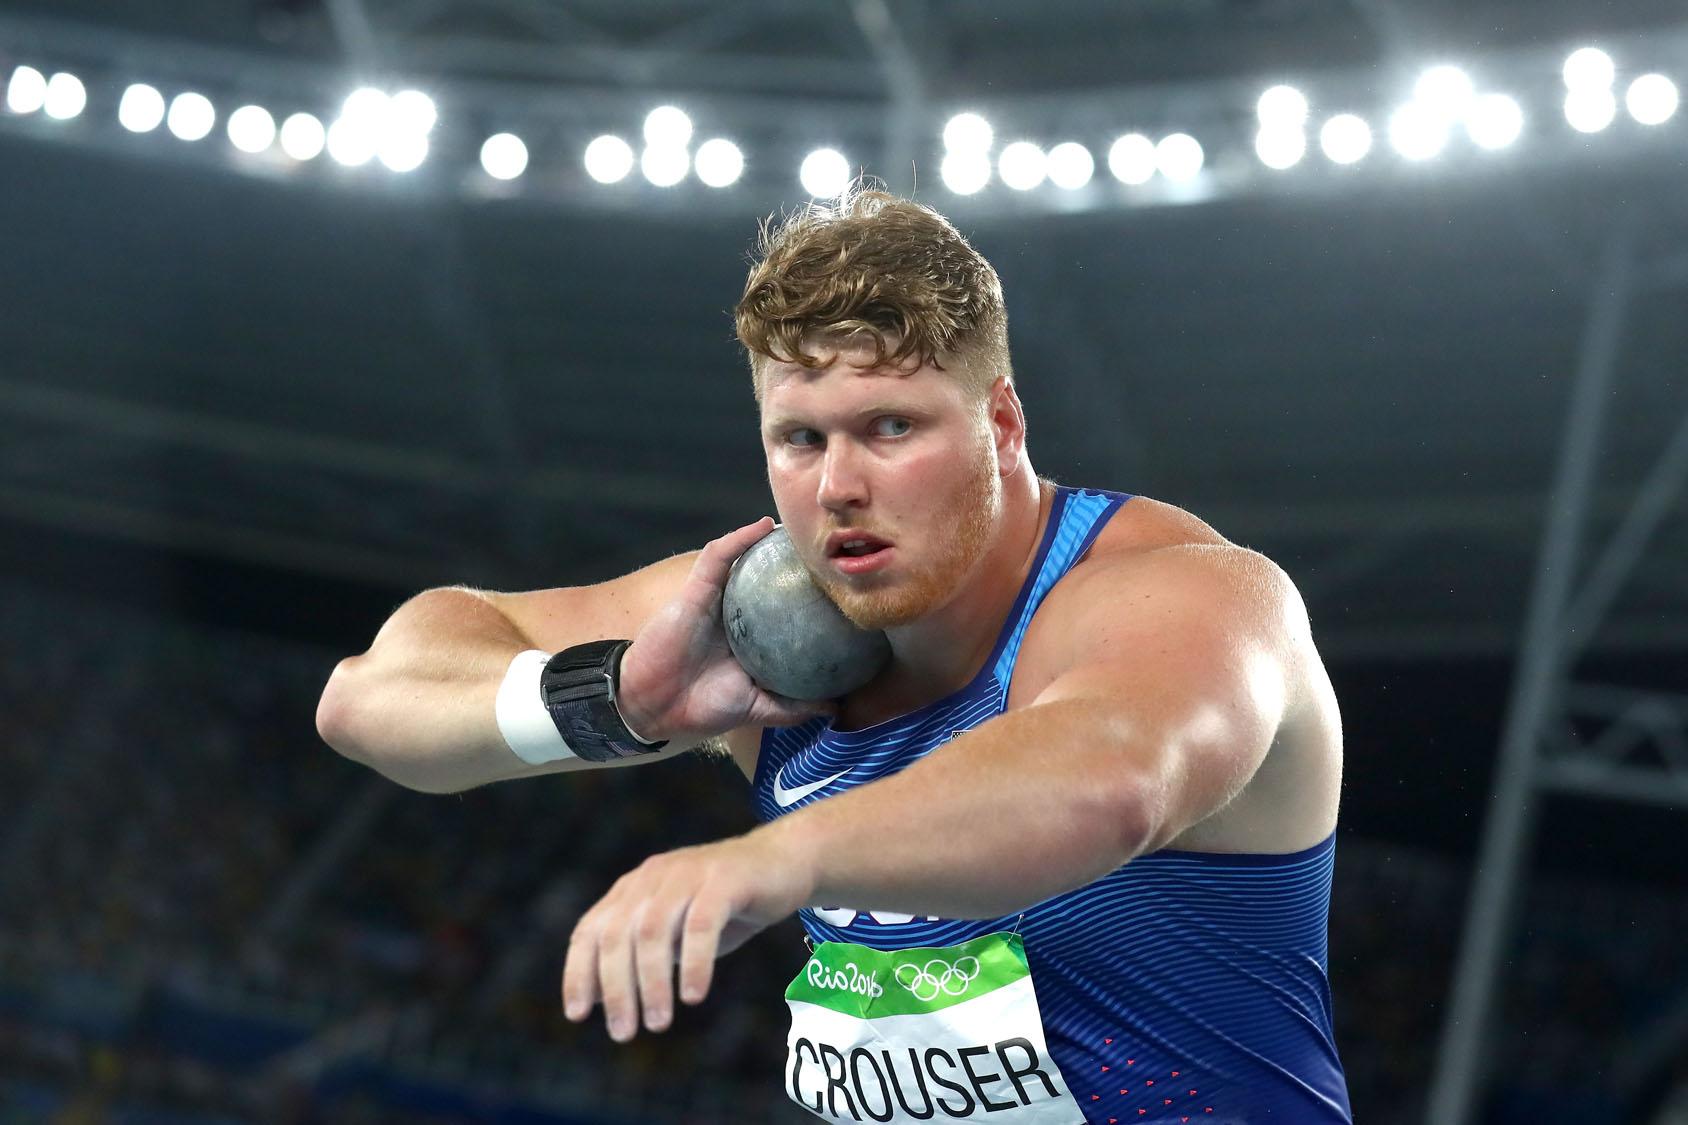 USA's Ryan Crouser takes gold in men's shot put final at Rio 2016 Olympics